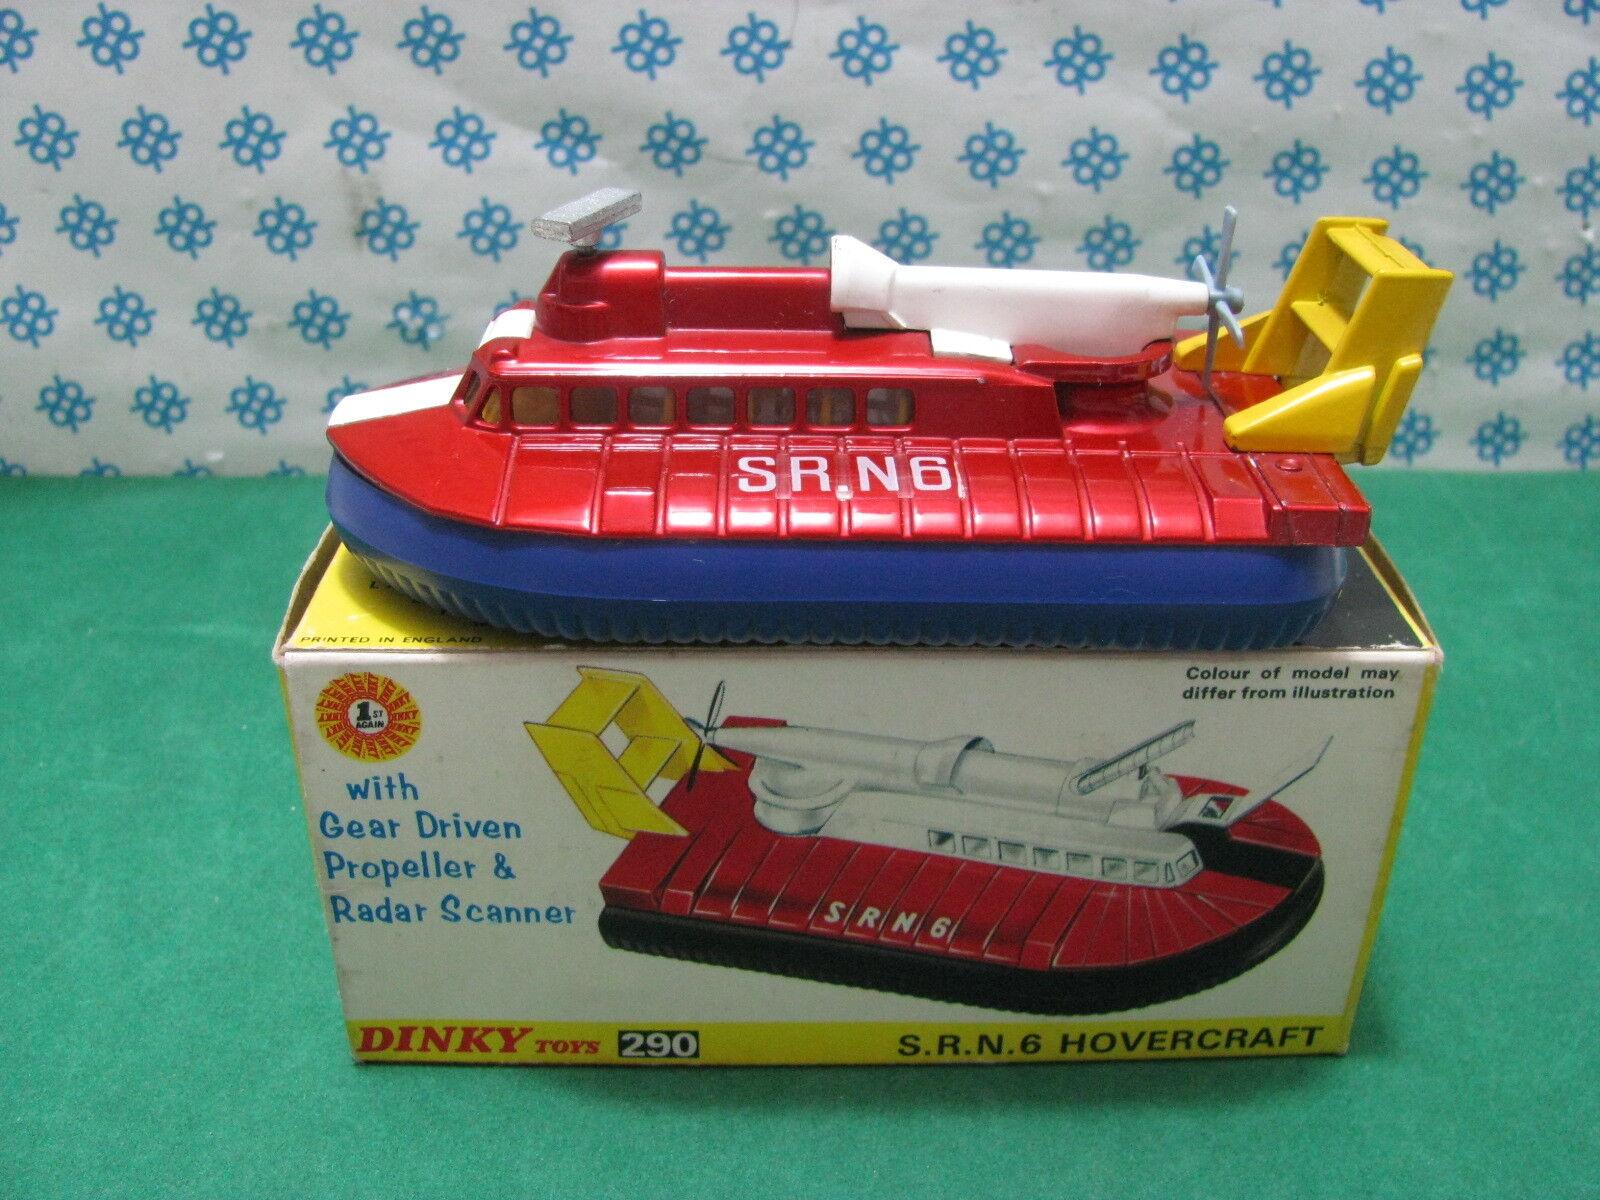 Vintage - HOVERCRAFT  SRN6        -  Dinky toys  290   Mint in Box